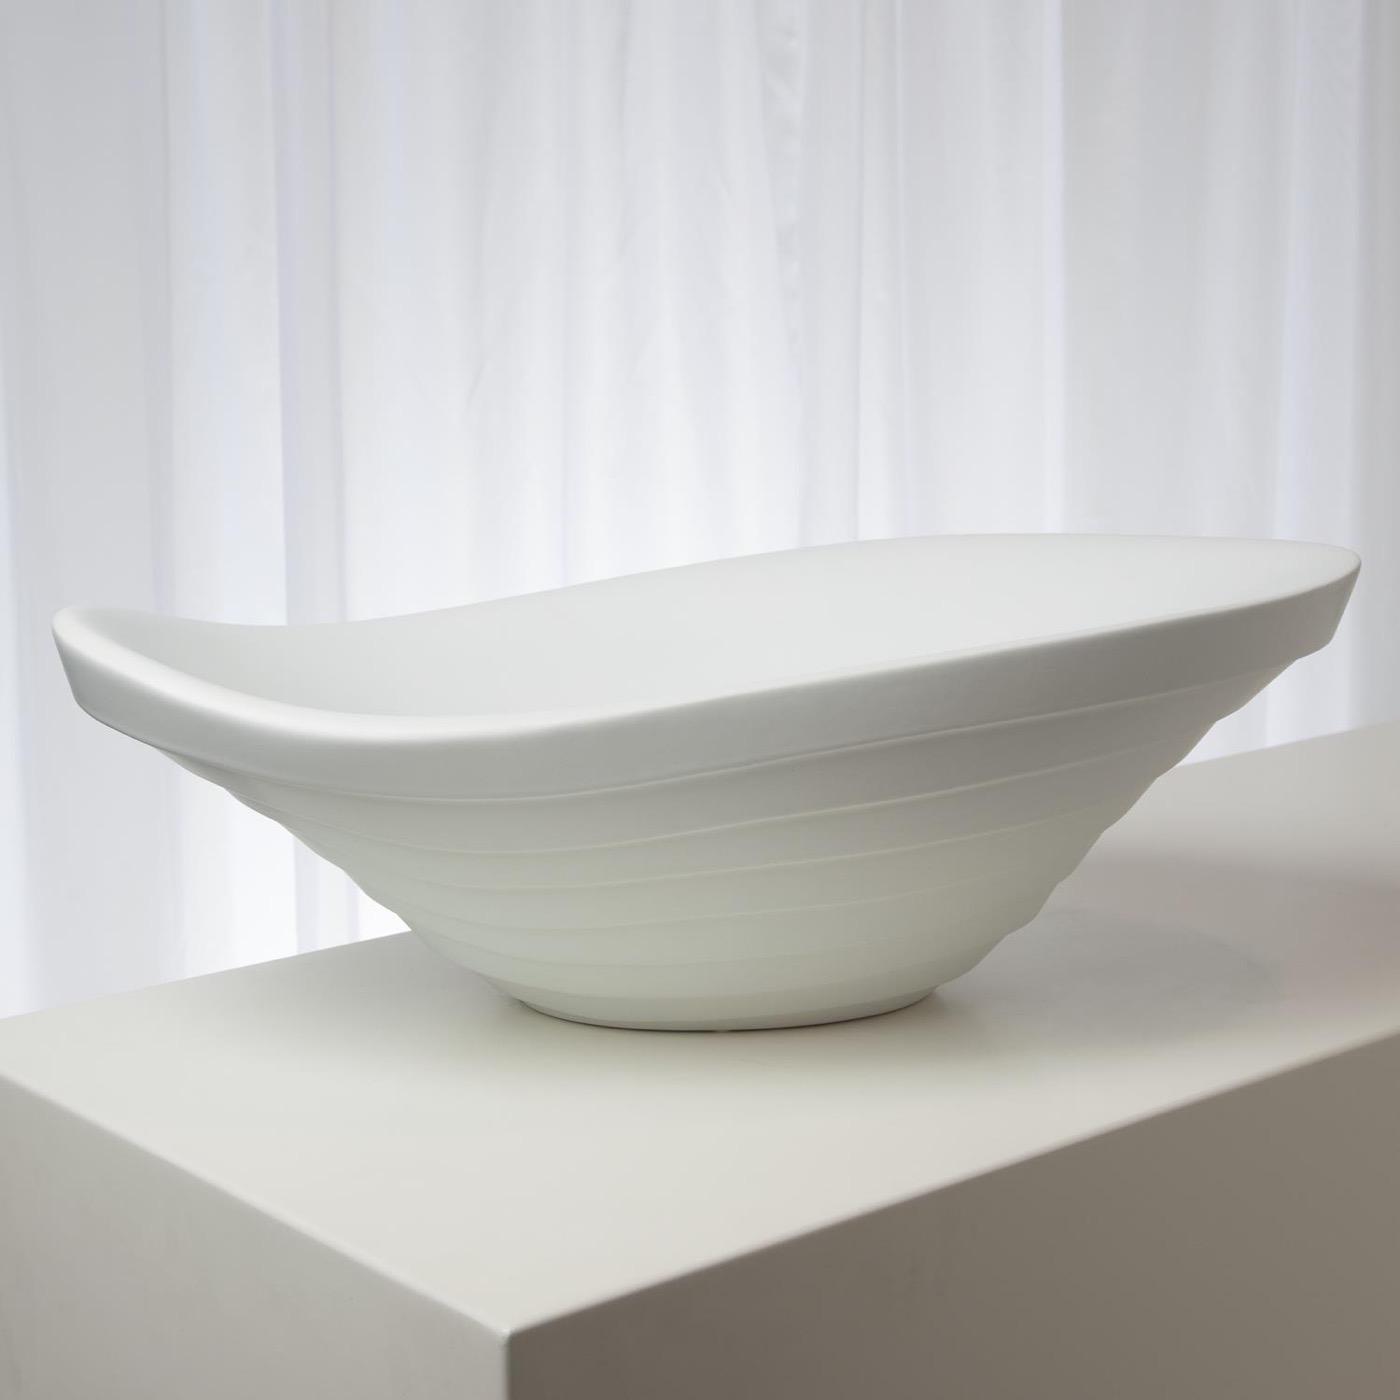 Terrazzo Ceramic Bowl